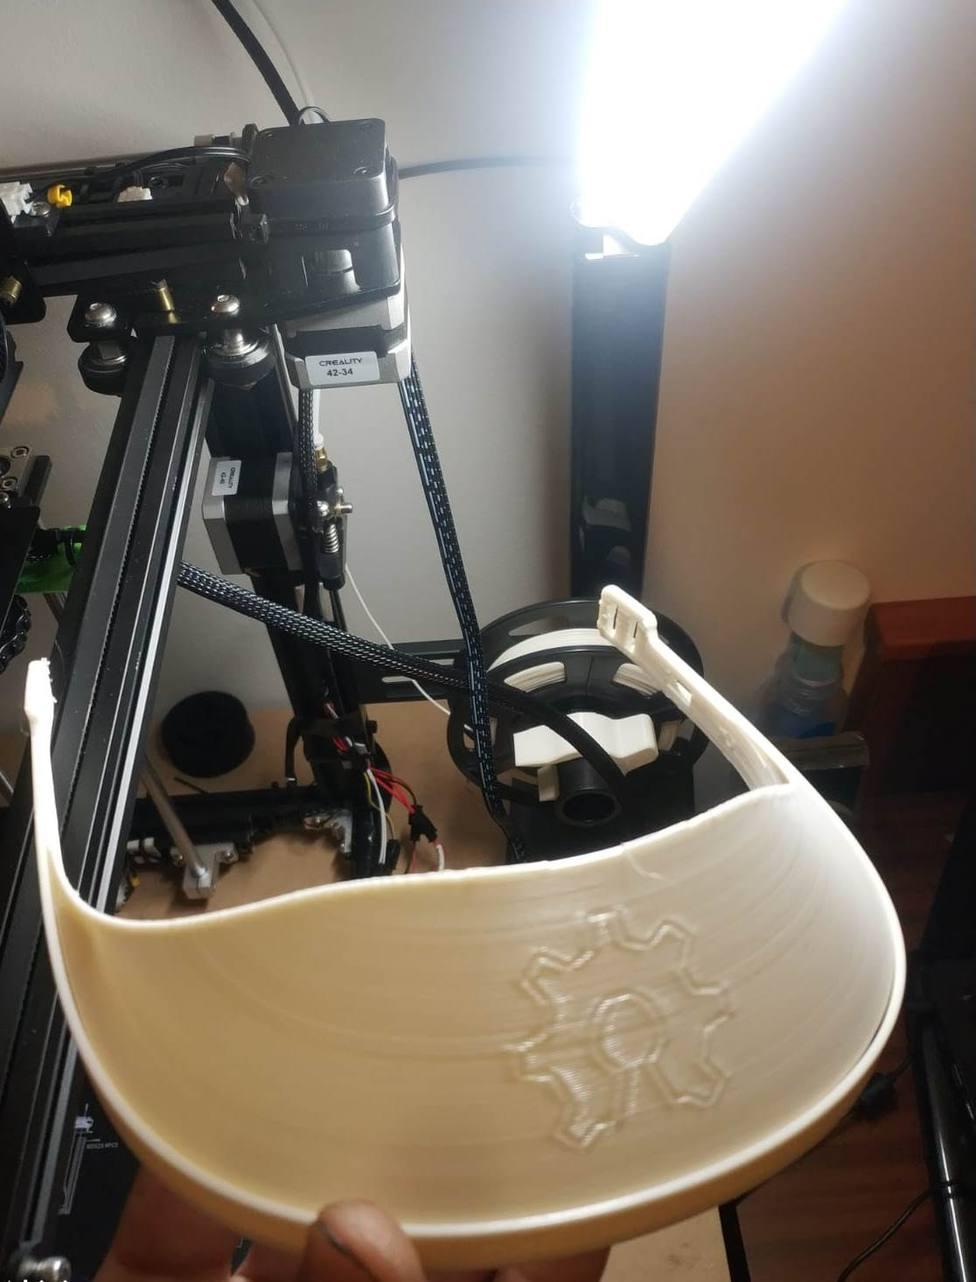 Un soberino usa impresoras 3D de piezas para drones para fabricar mascarillas que entrega gratis